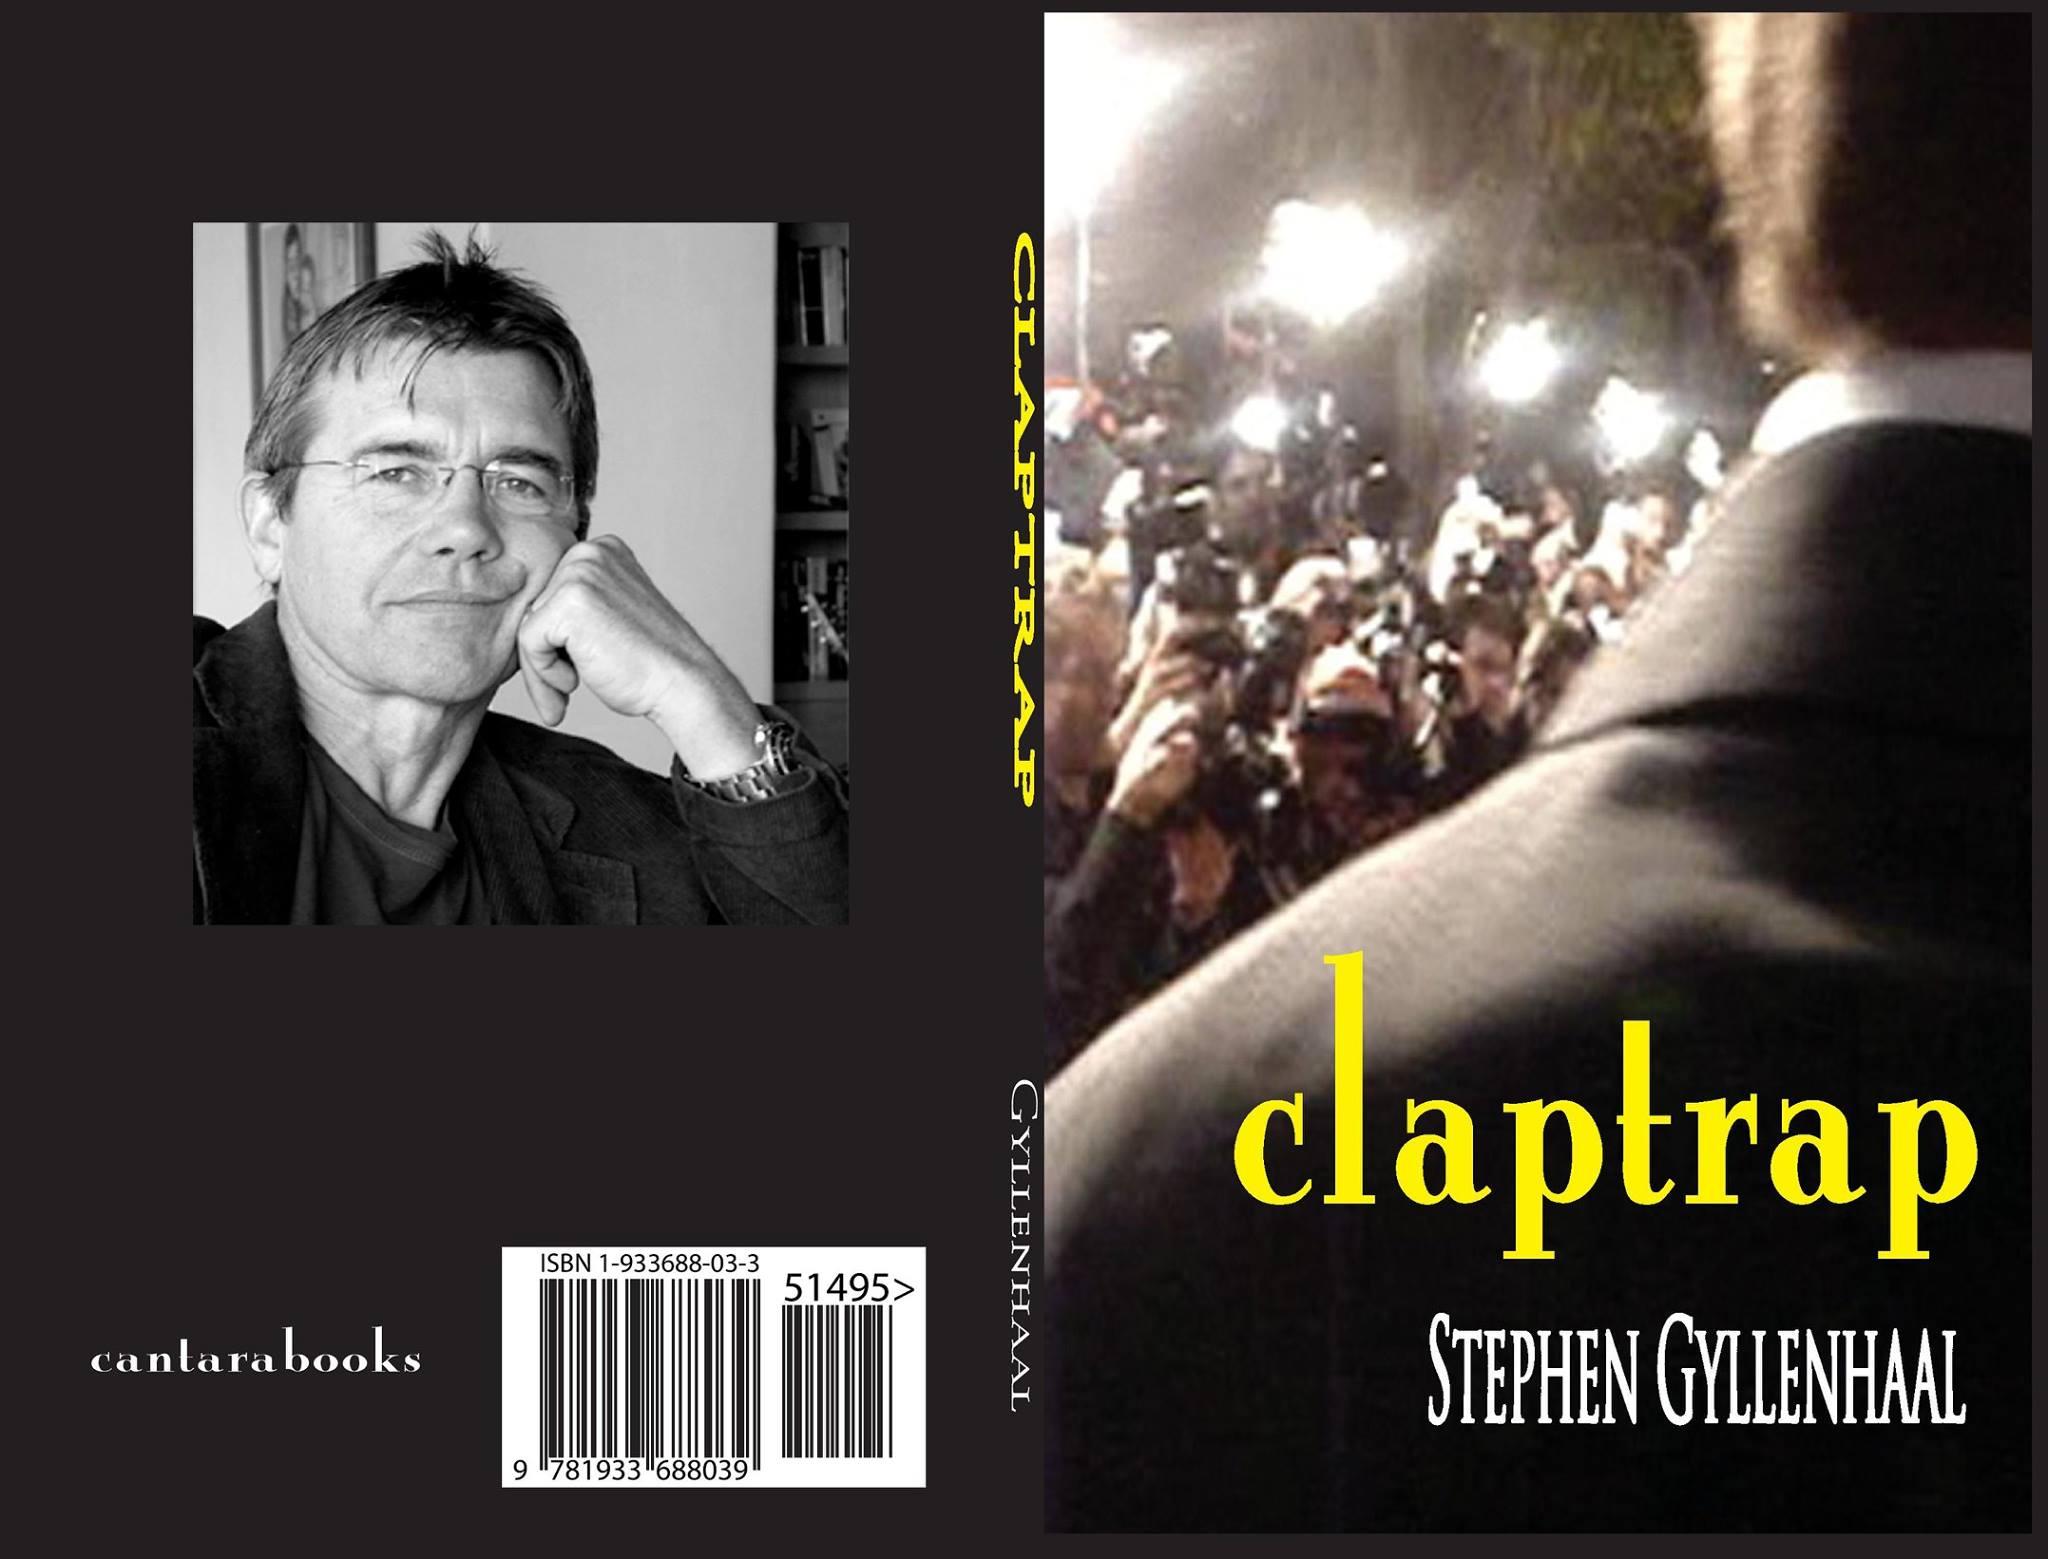 Claptrap by Stephen Gyllenhaal